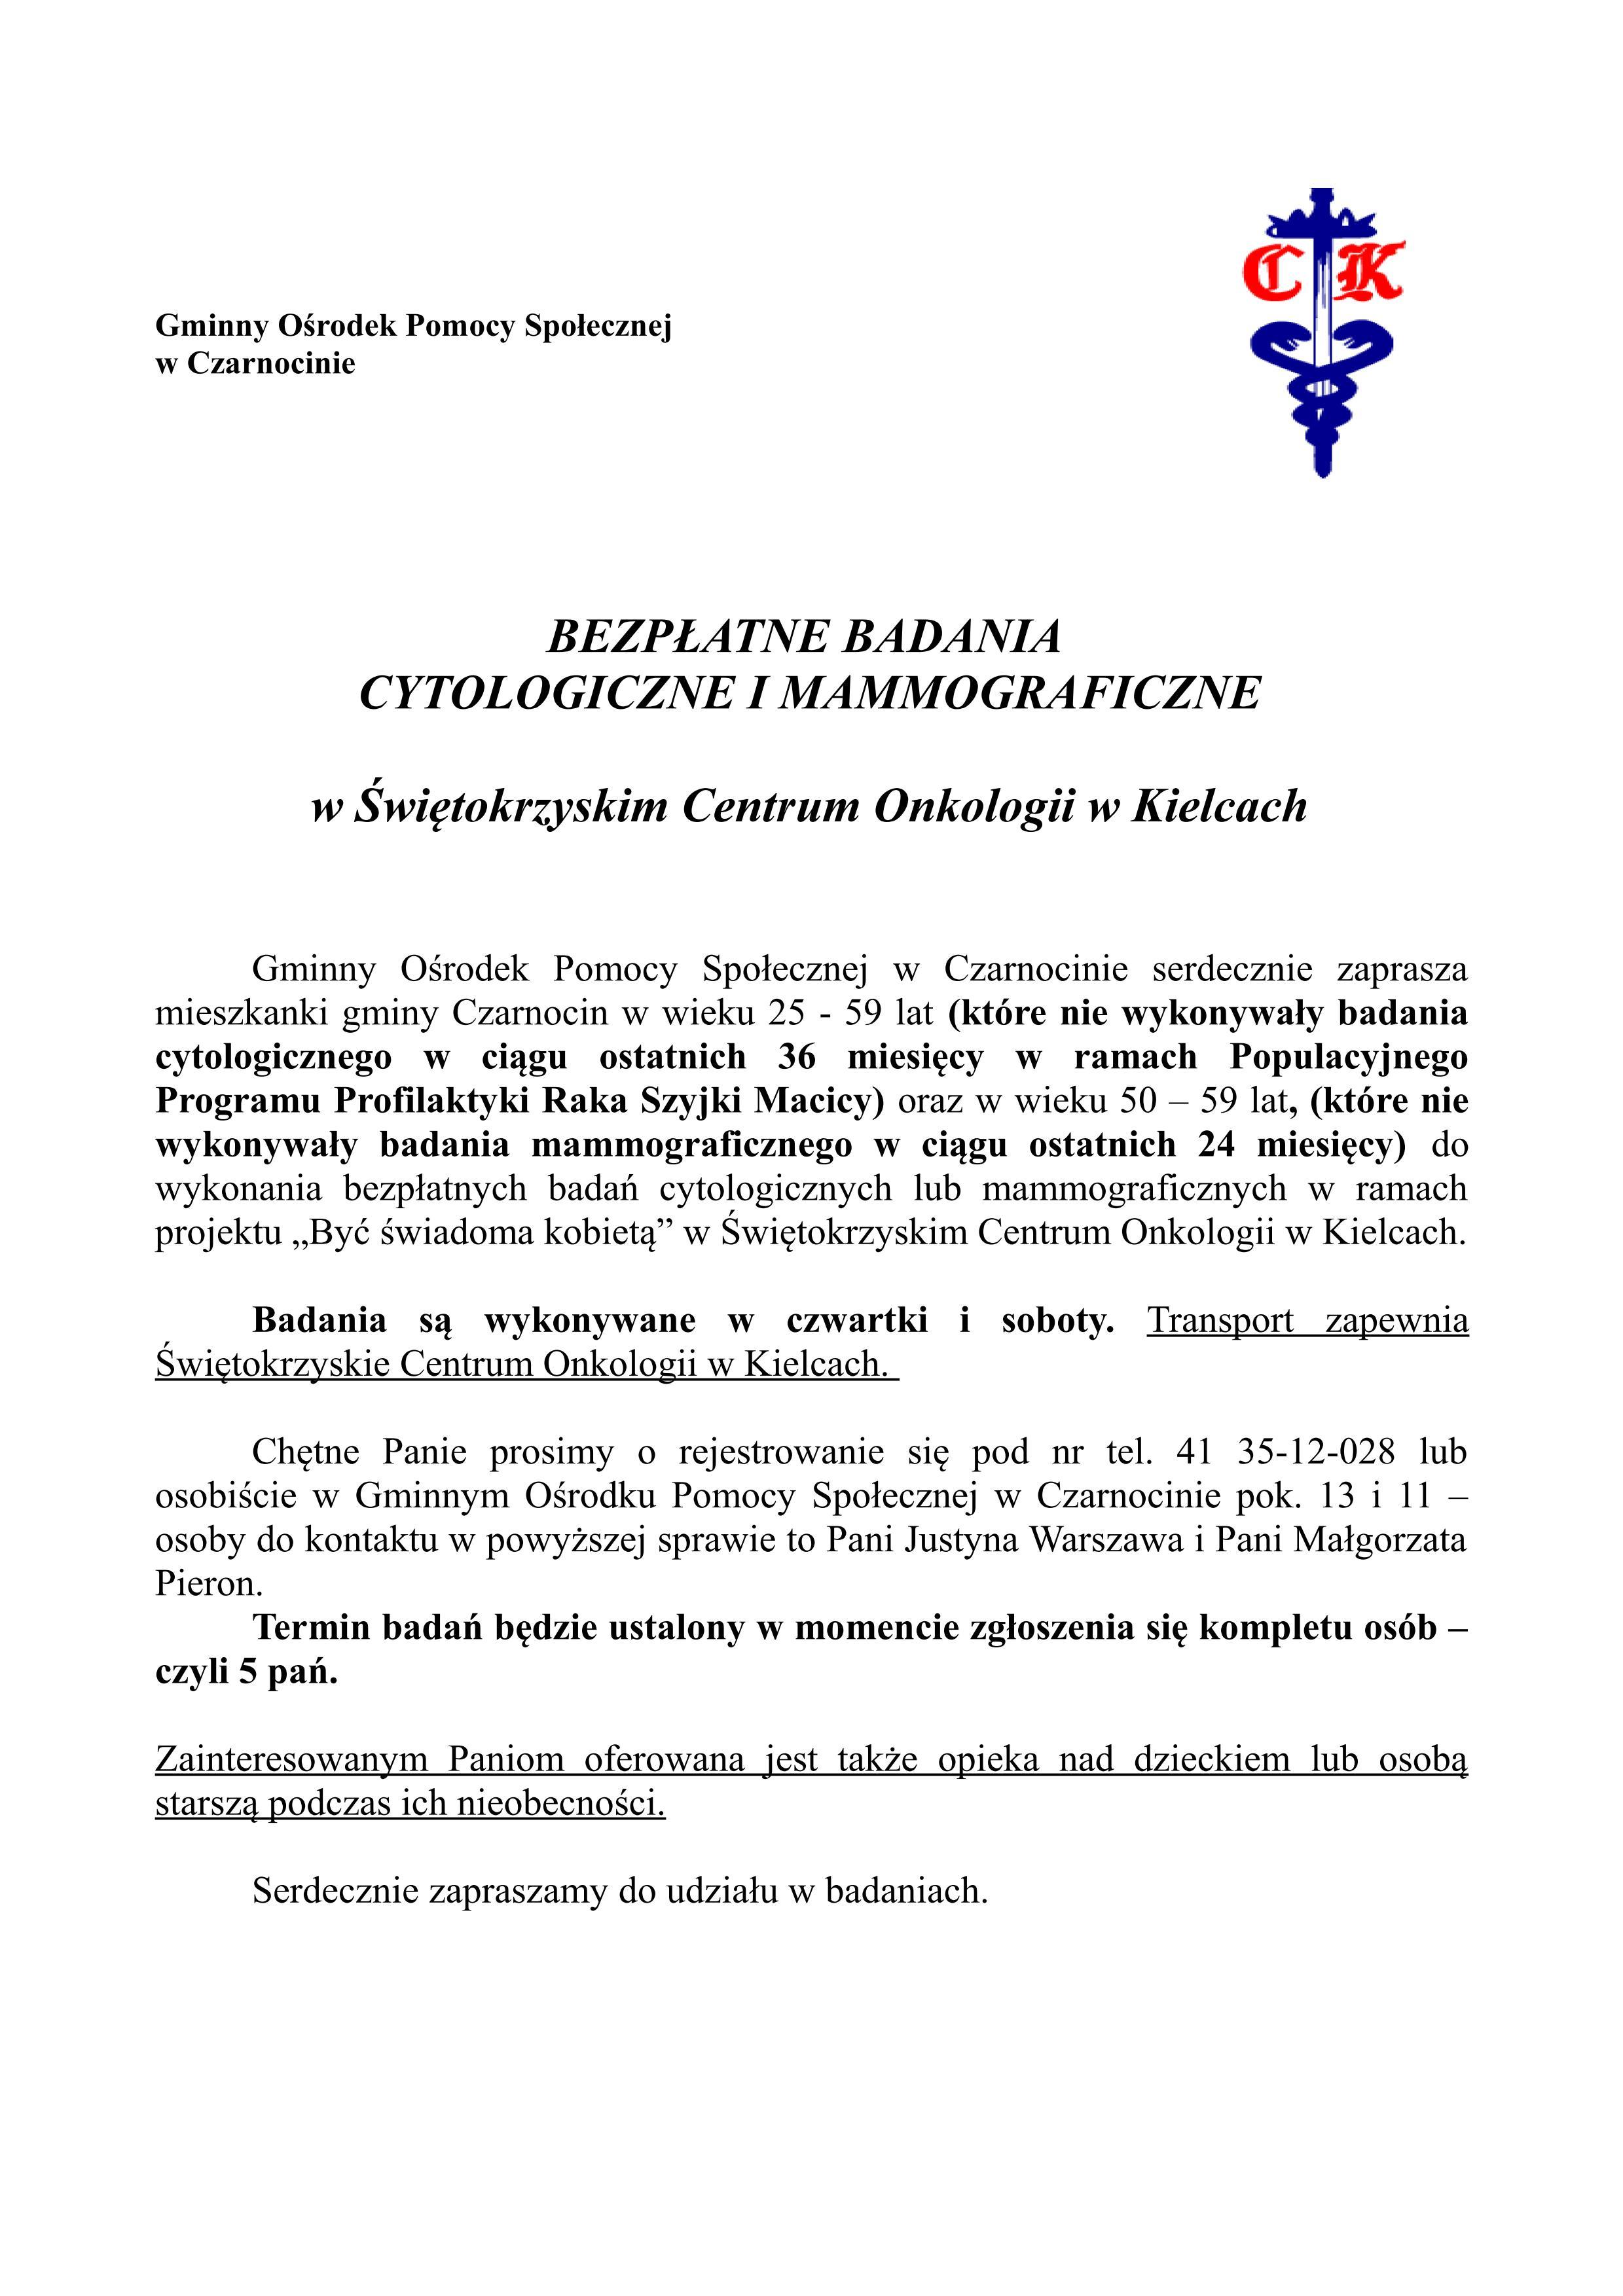 cytologia1012017.jpg